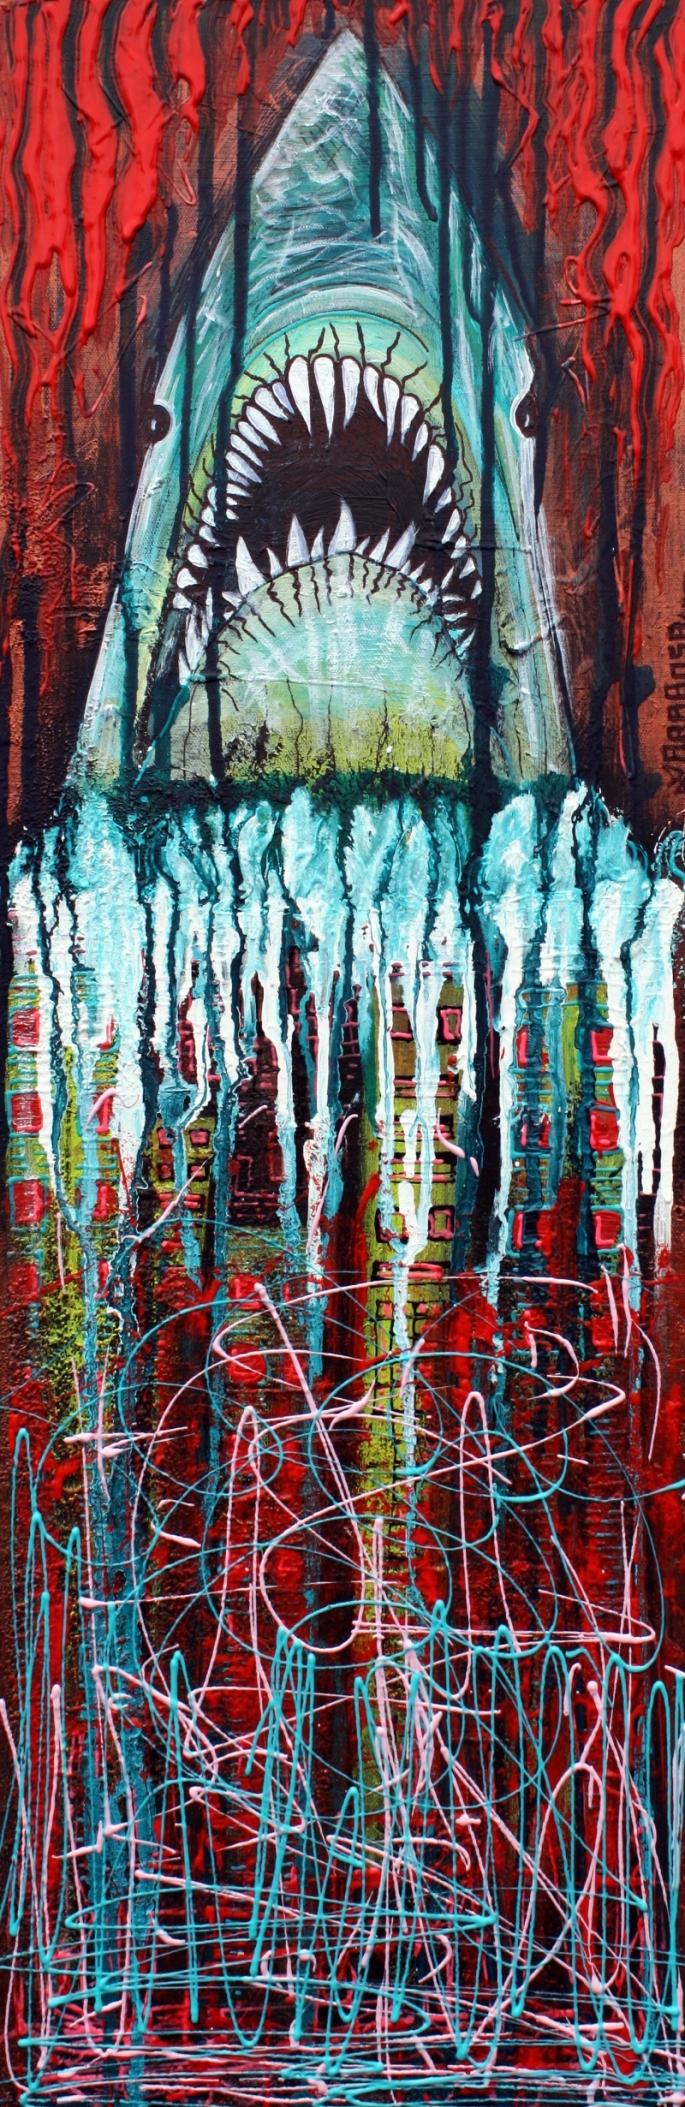 Splatterday by Laura Barbosa 2013 12x36 - Canvas Art